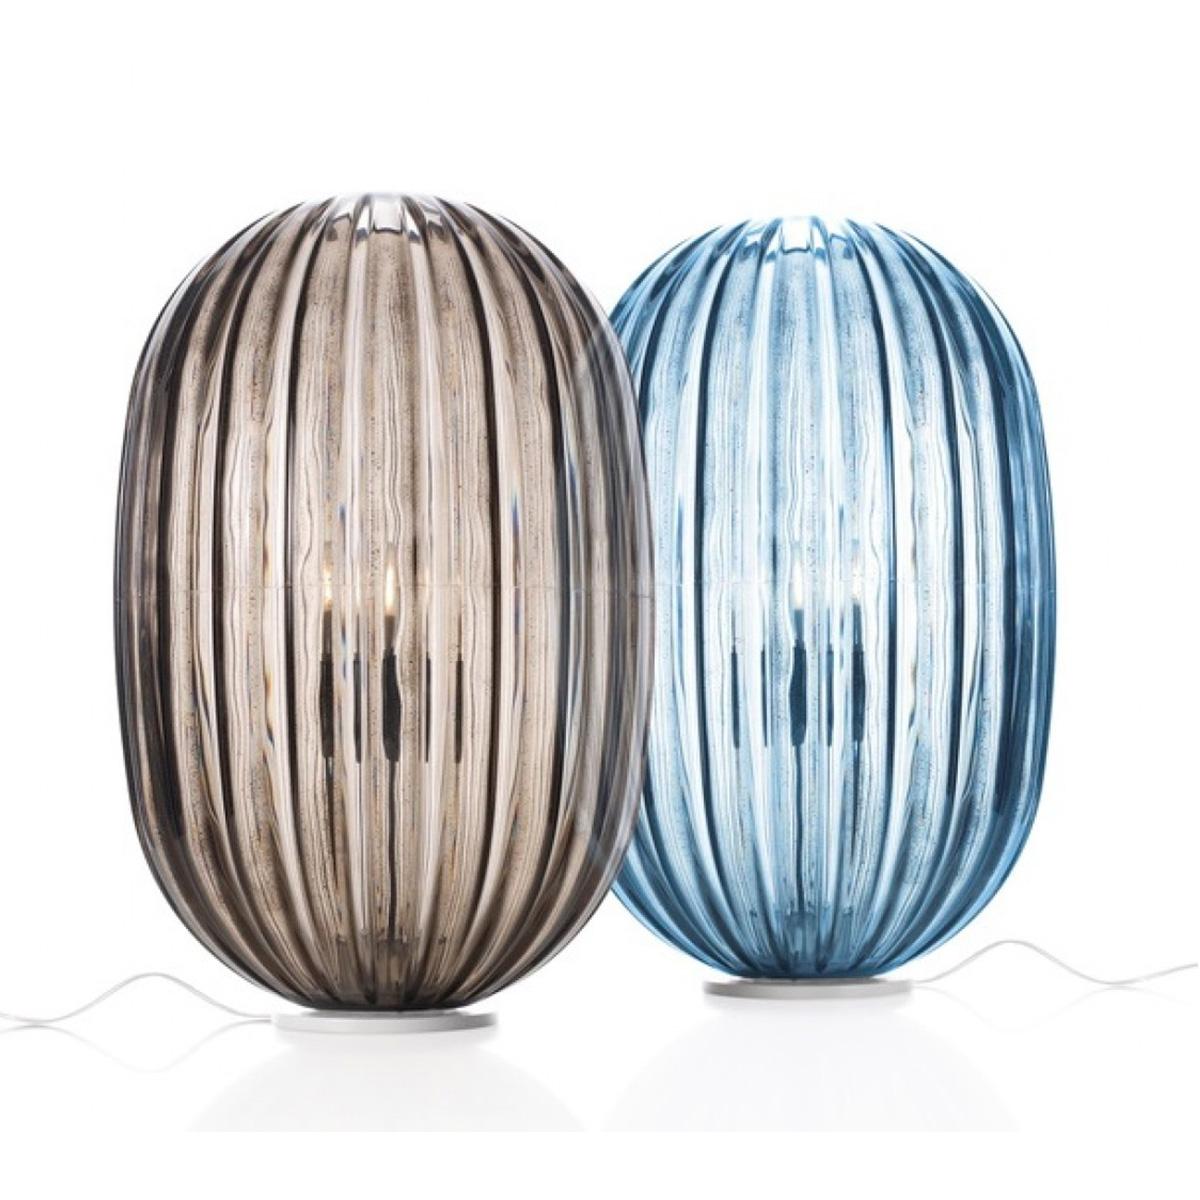 Stona lampa PLASS MEDIA 2240012 30 plava